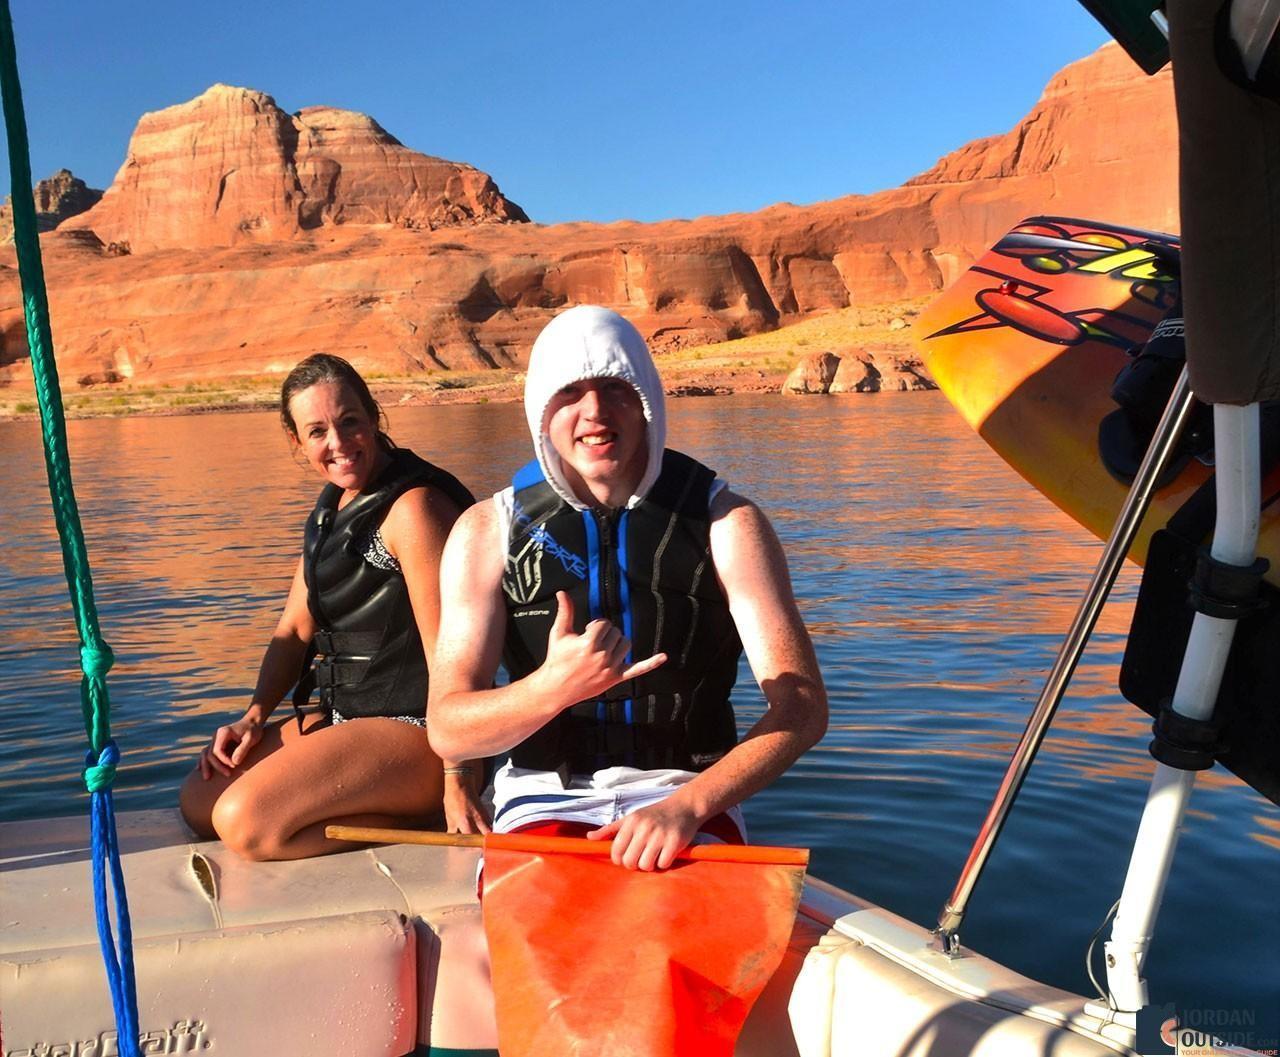 Julie and Jared at Lake Powell